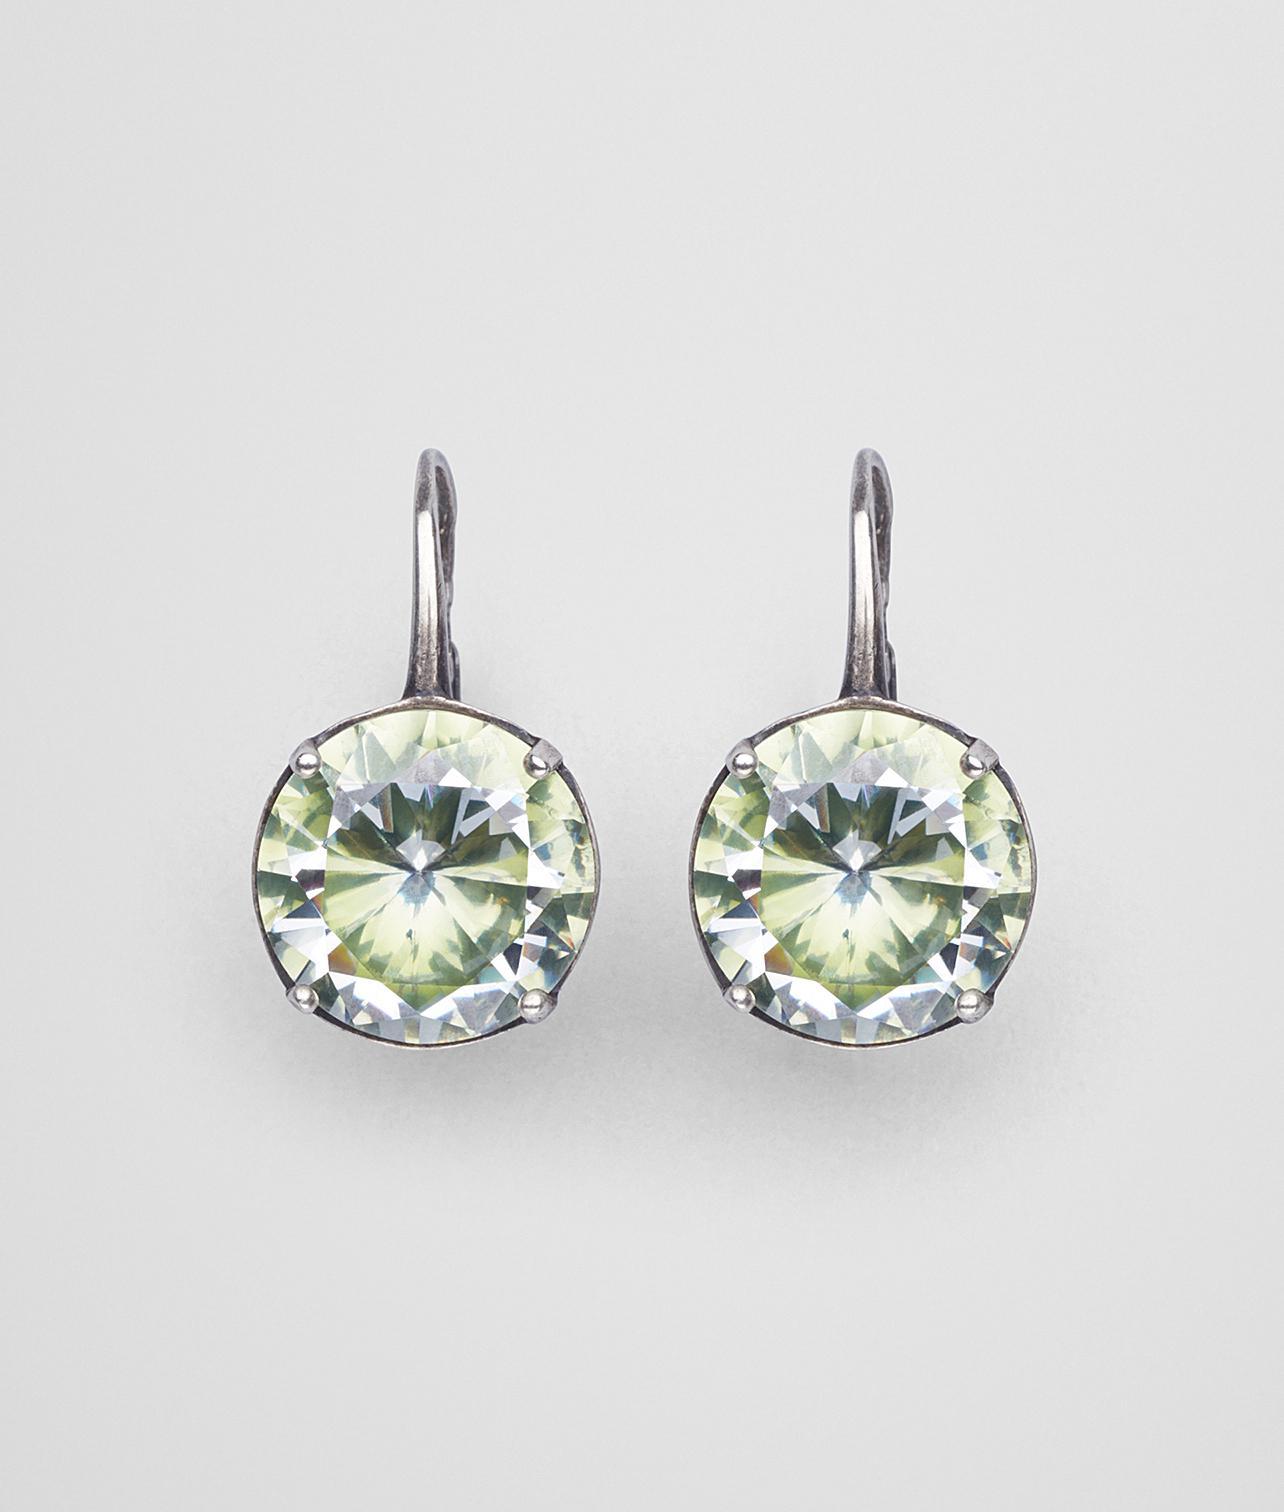 Bottega Veneta Chamomile Cubic Zirconia/Oxidized Silver Earrings Naturale chamomile 3nJsaClSj